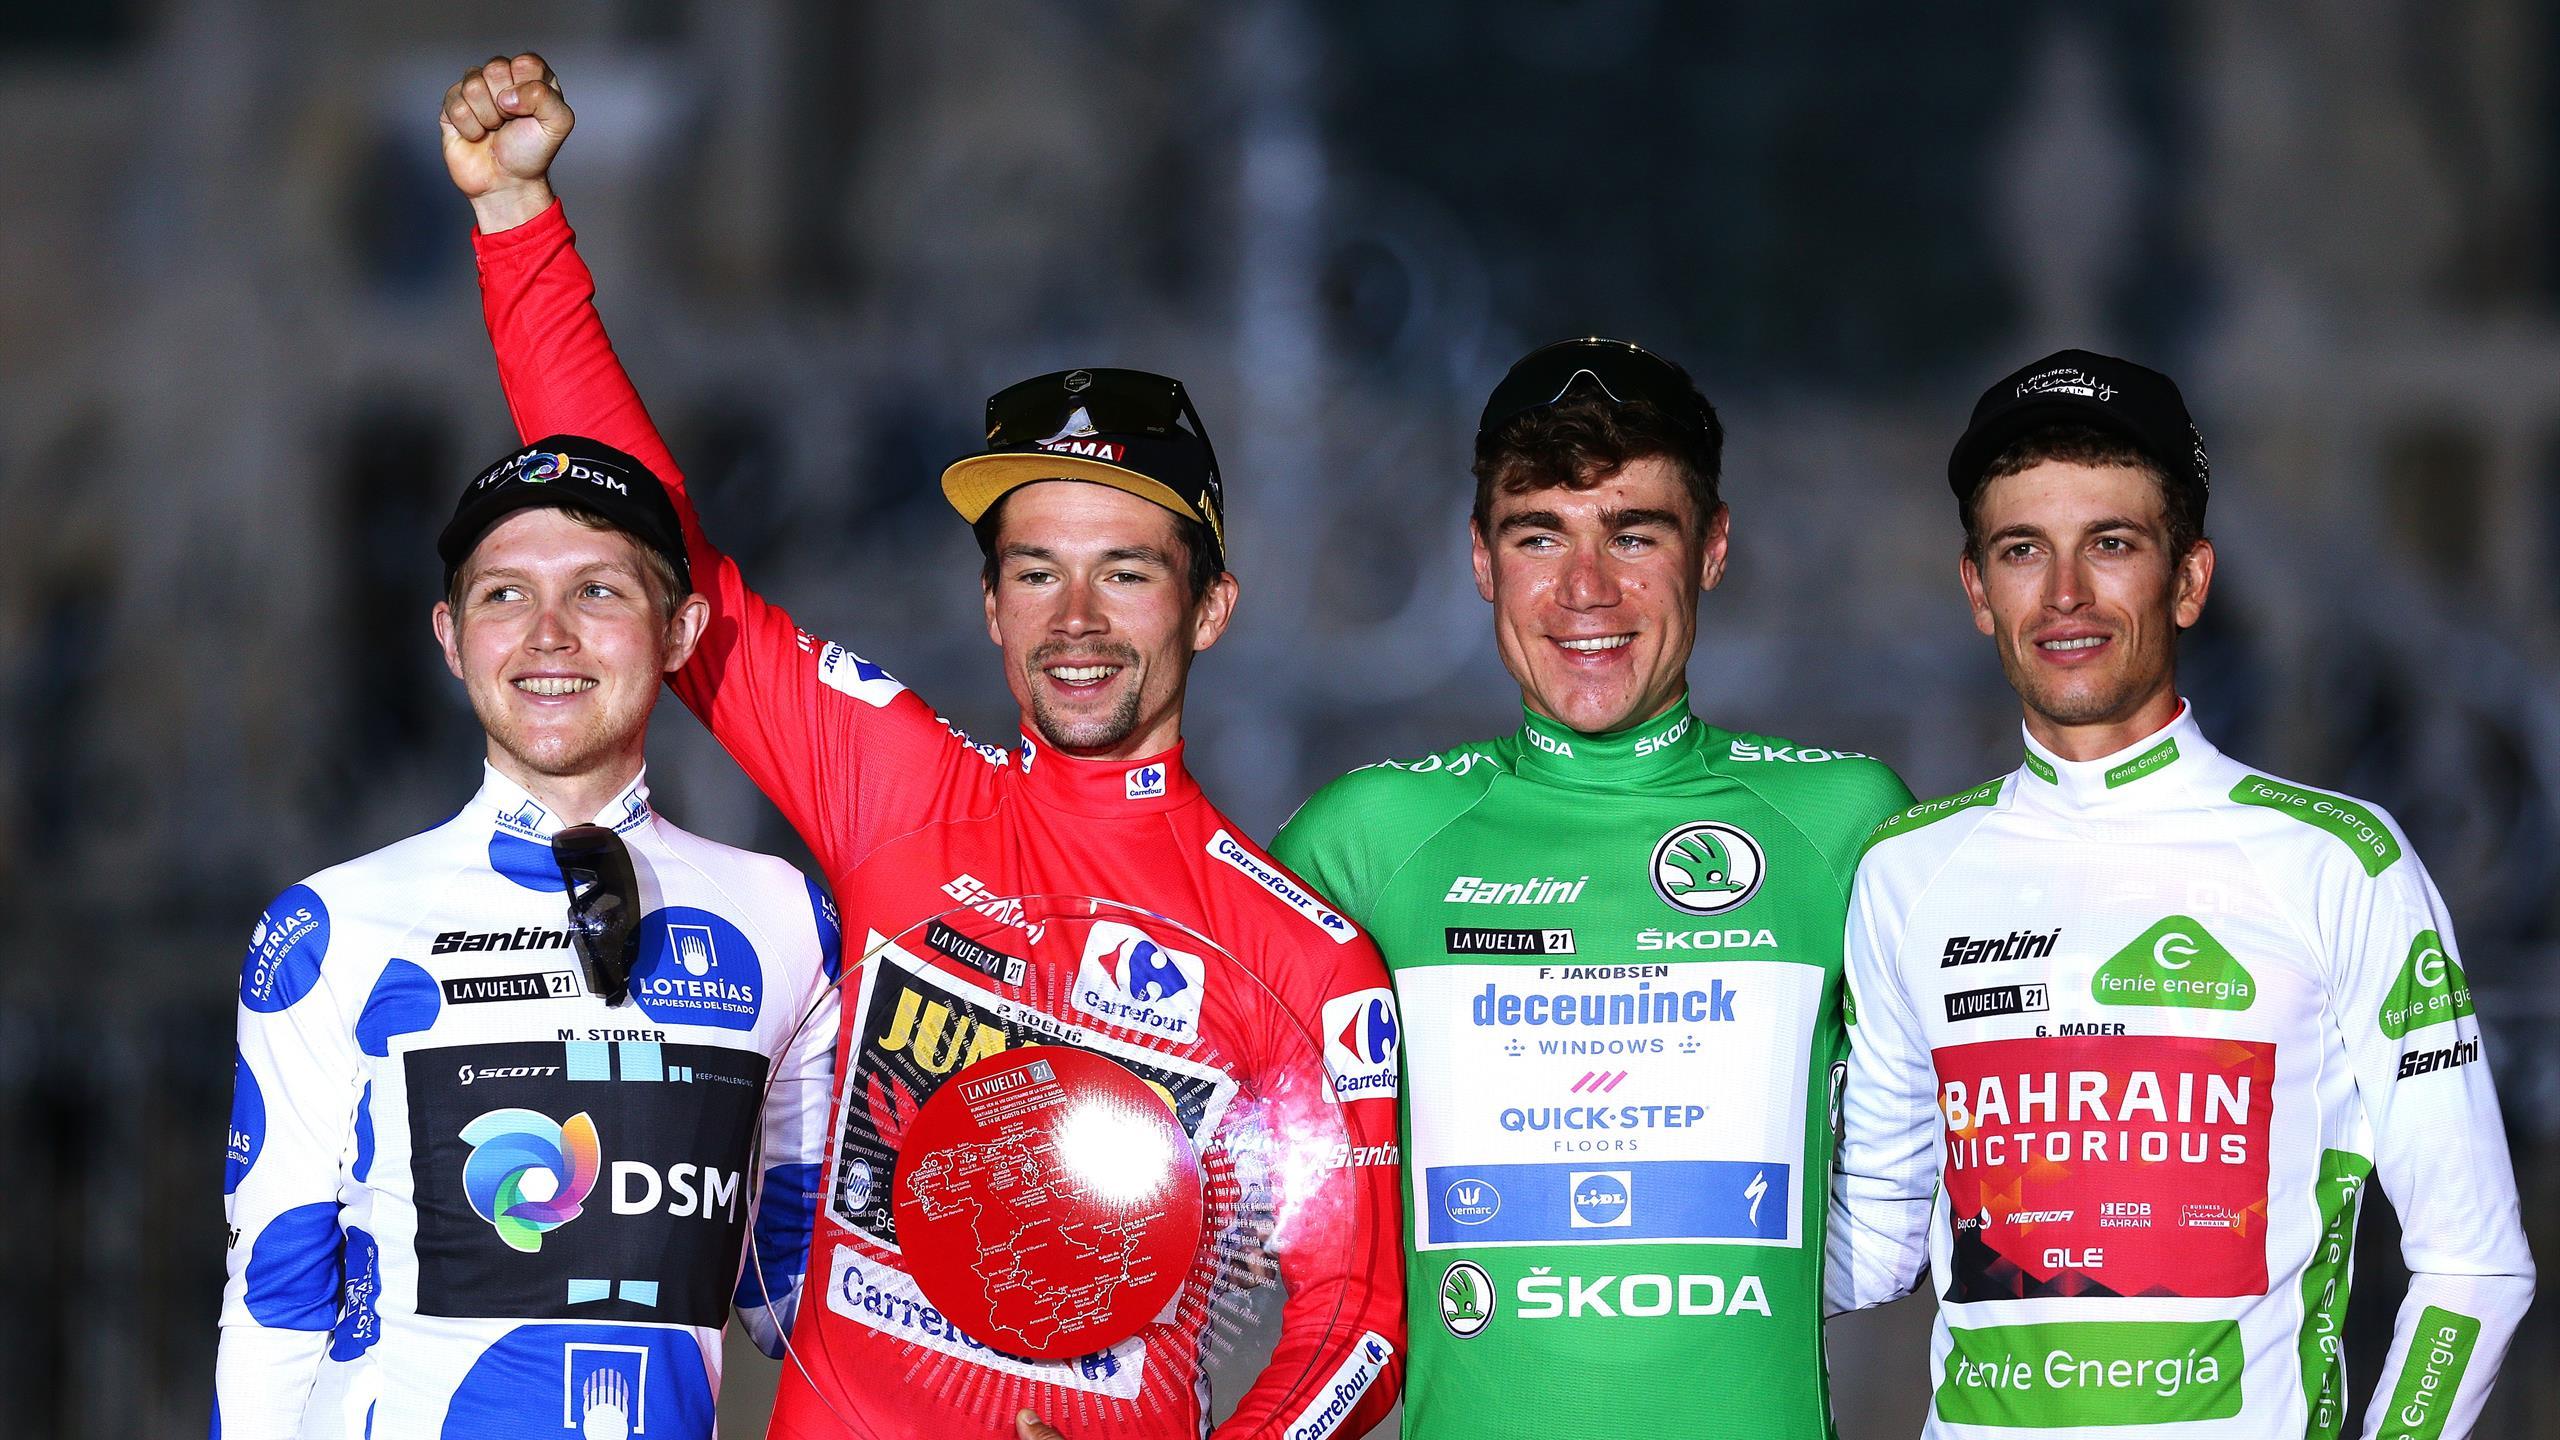 La Vuelta s'élancera d'Utrecht aux Pays-Bas en 2022 thumbnail